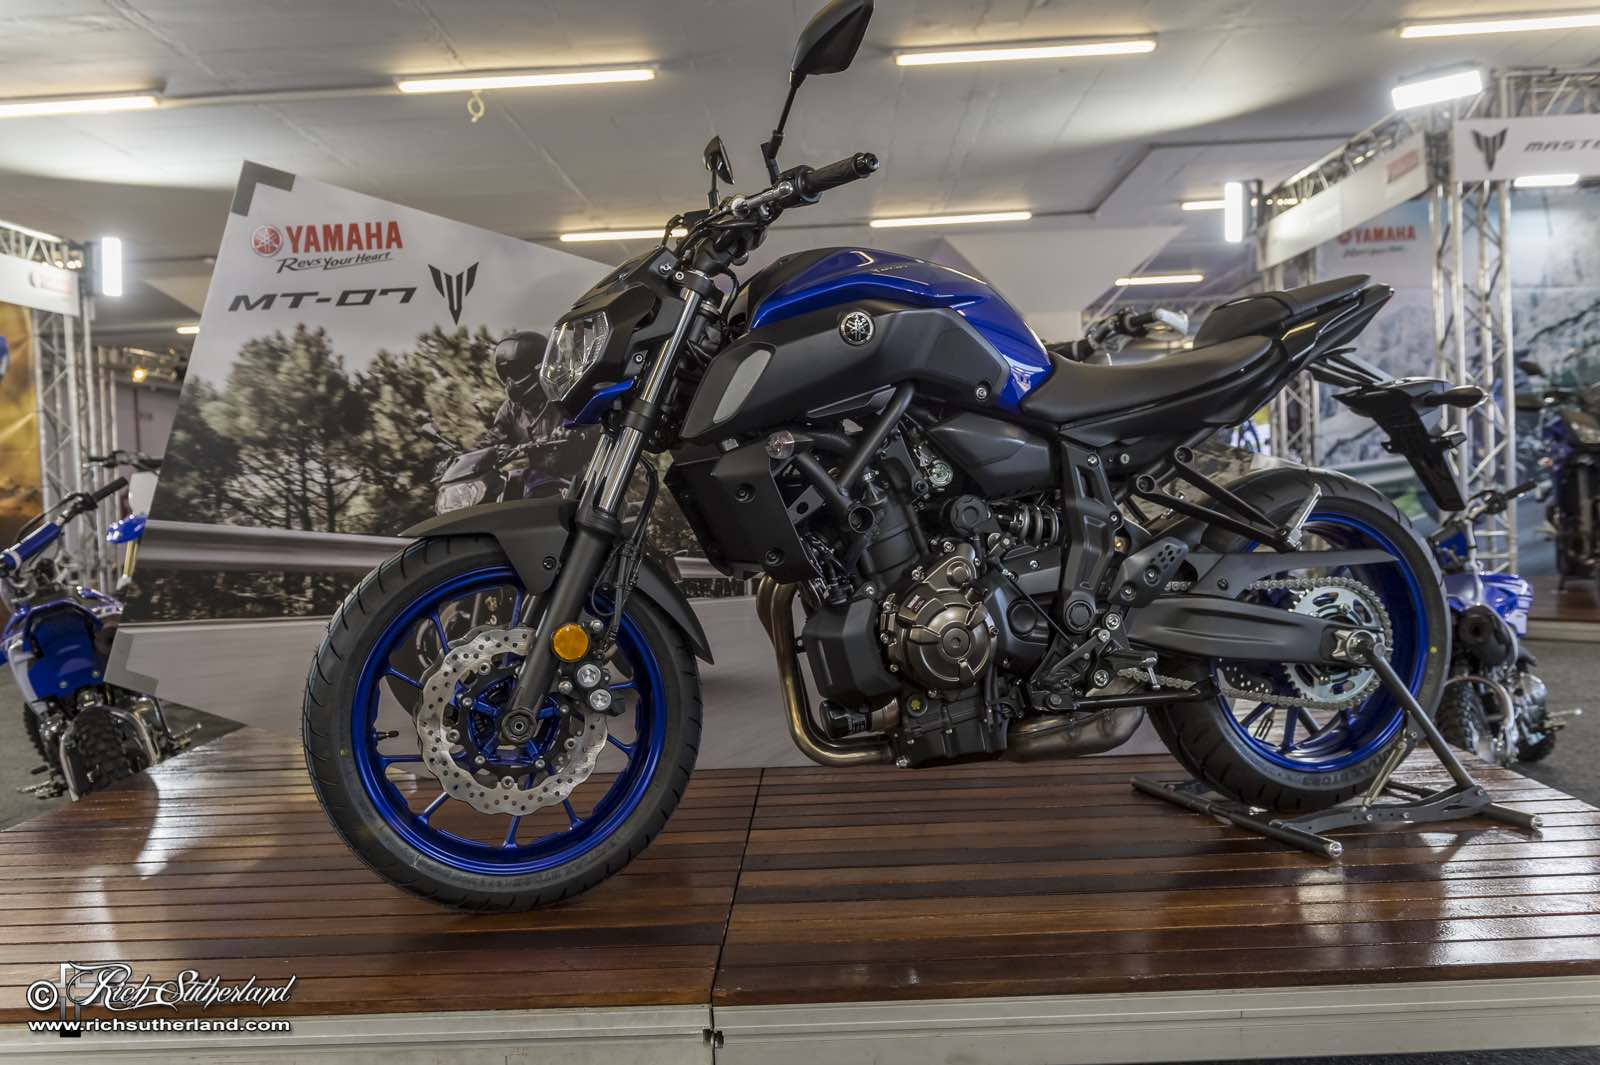 Yamaha representing at the 2018 SA Bike Fest